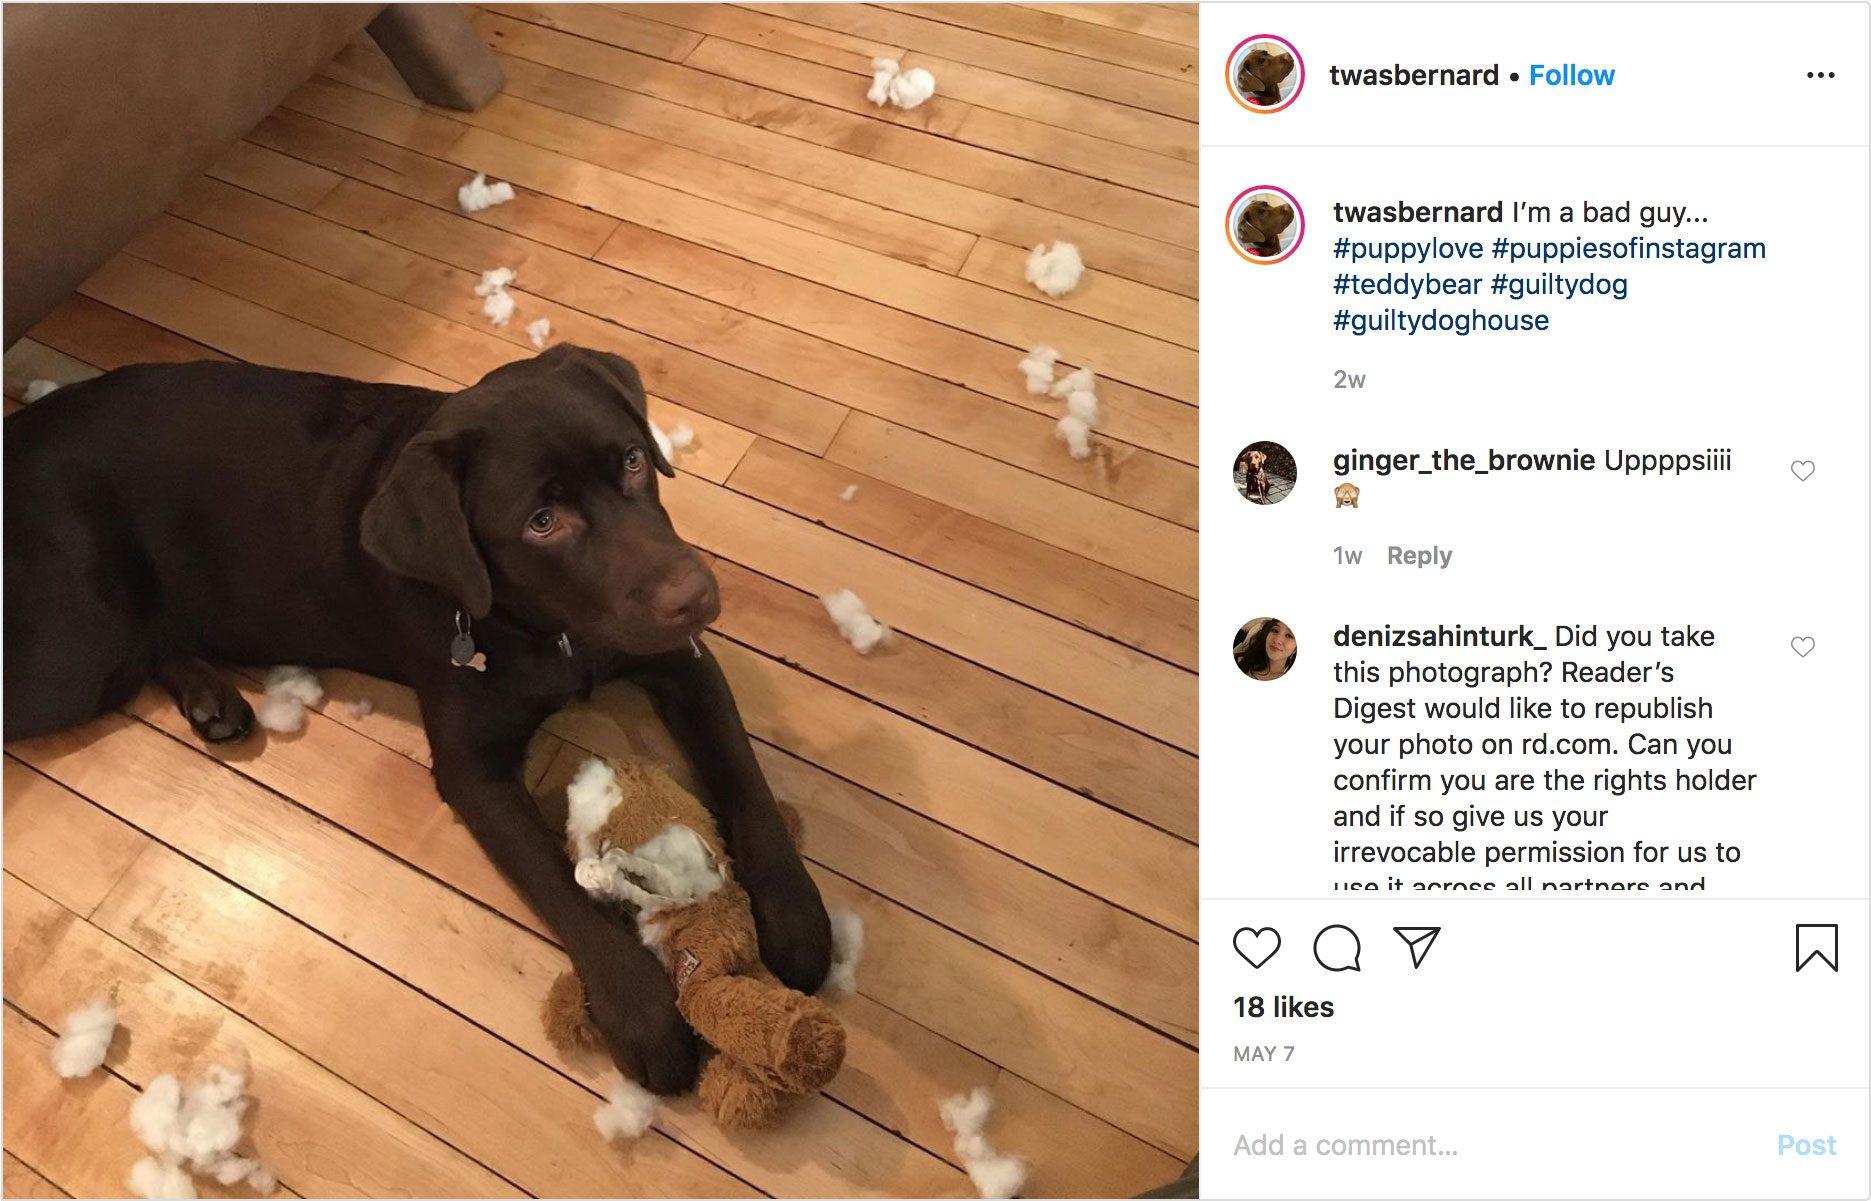 twasbernard on instagram. guilty dog.